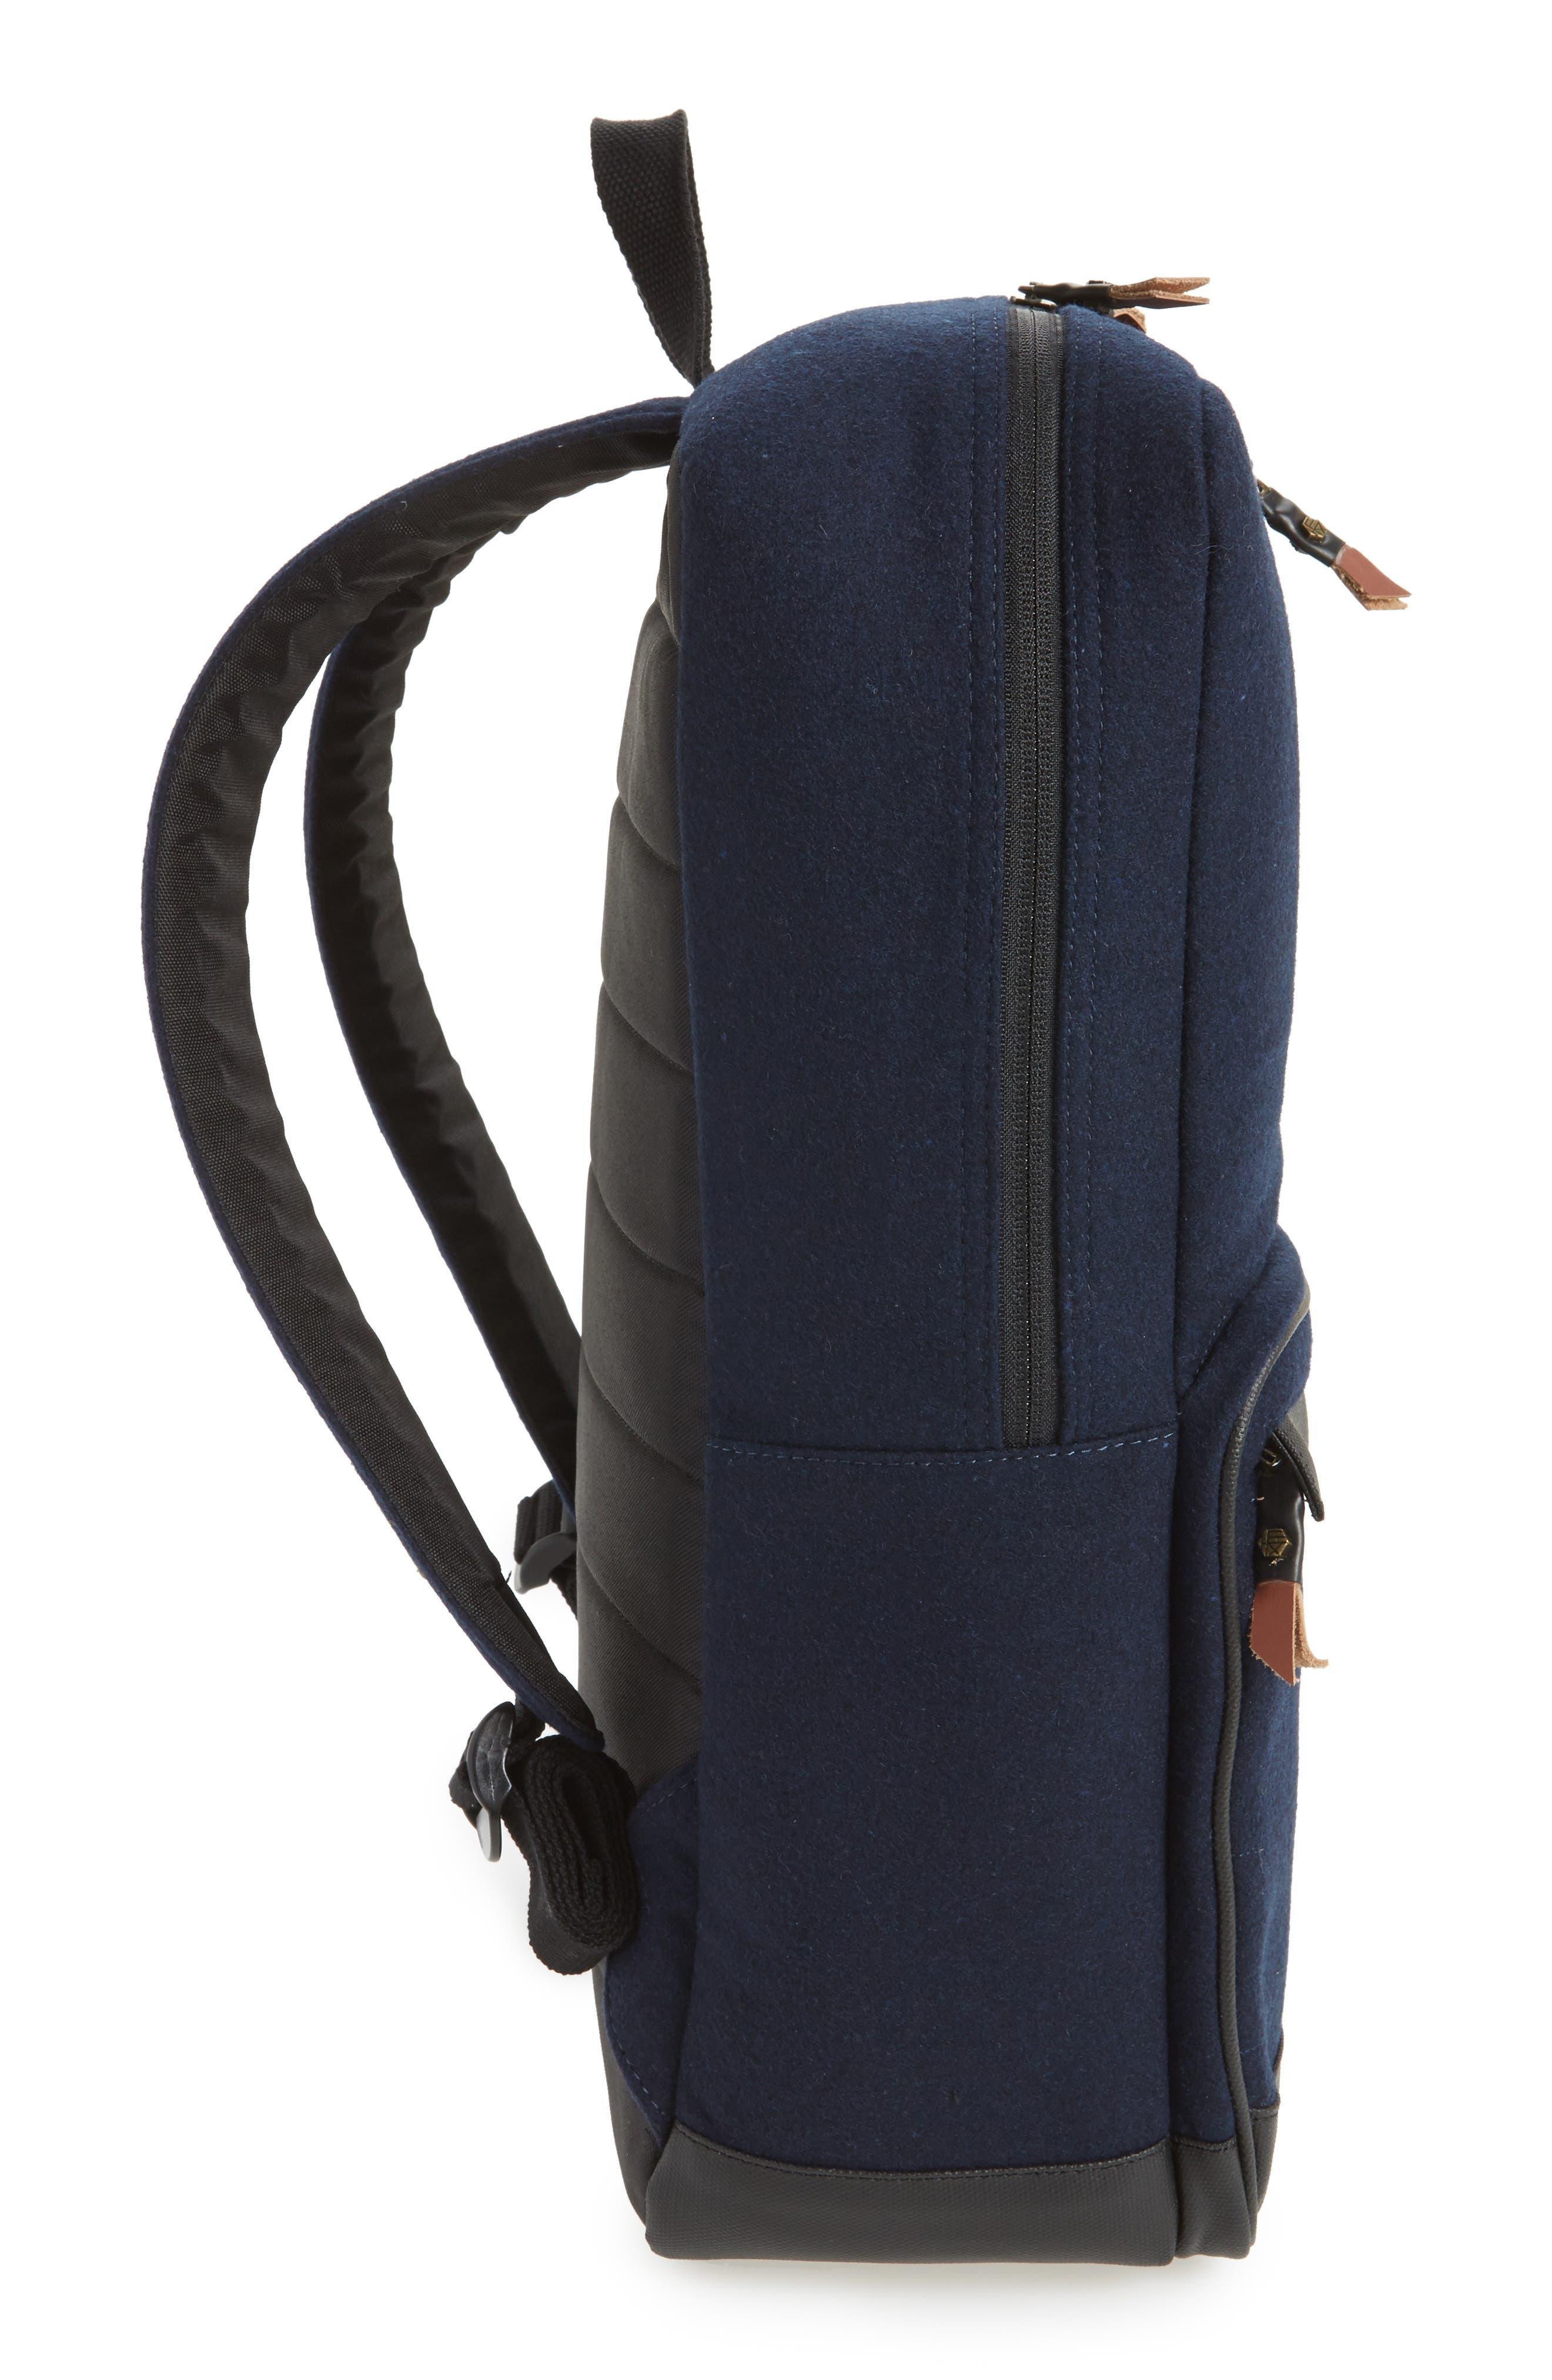 Radar Origin Water Resistant Commuter/Travel Laptop Backpack,                             Alternate thumbnail 5, color,                             410